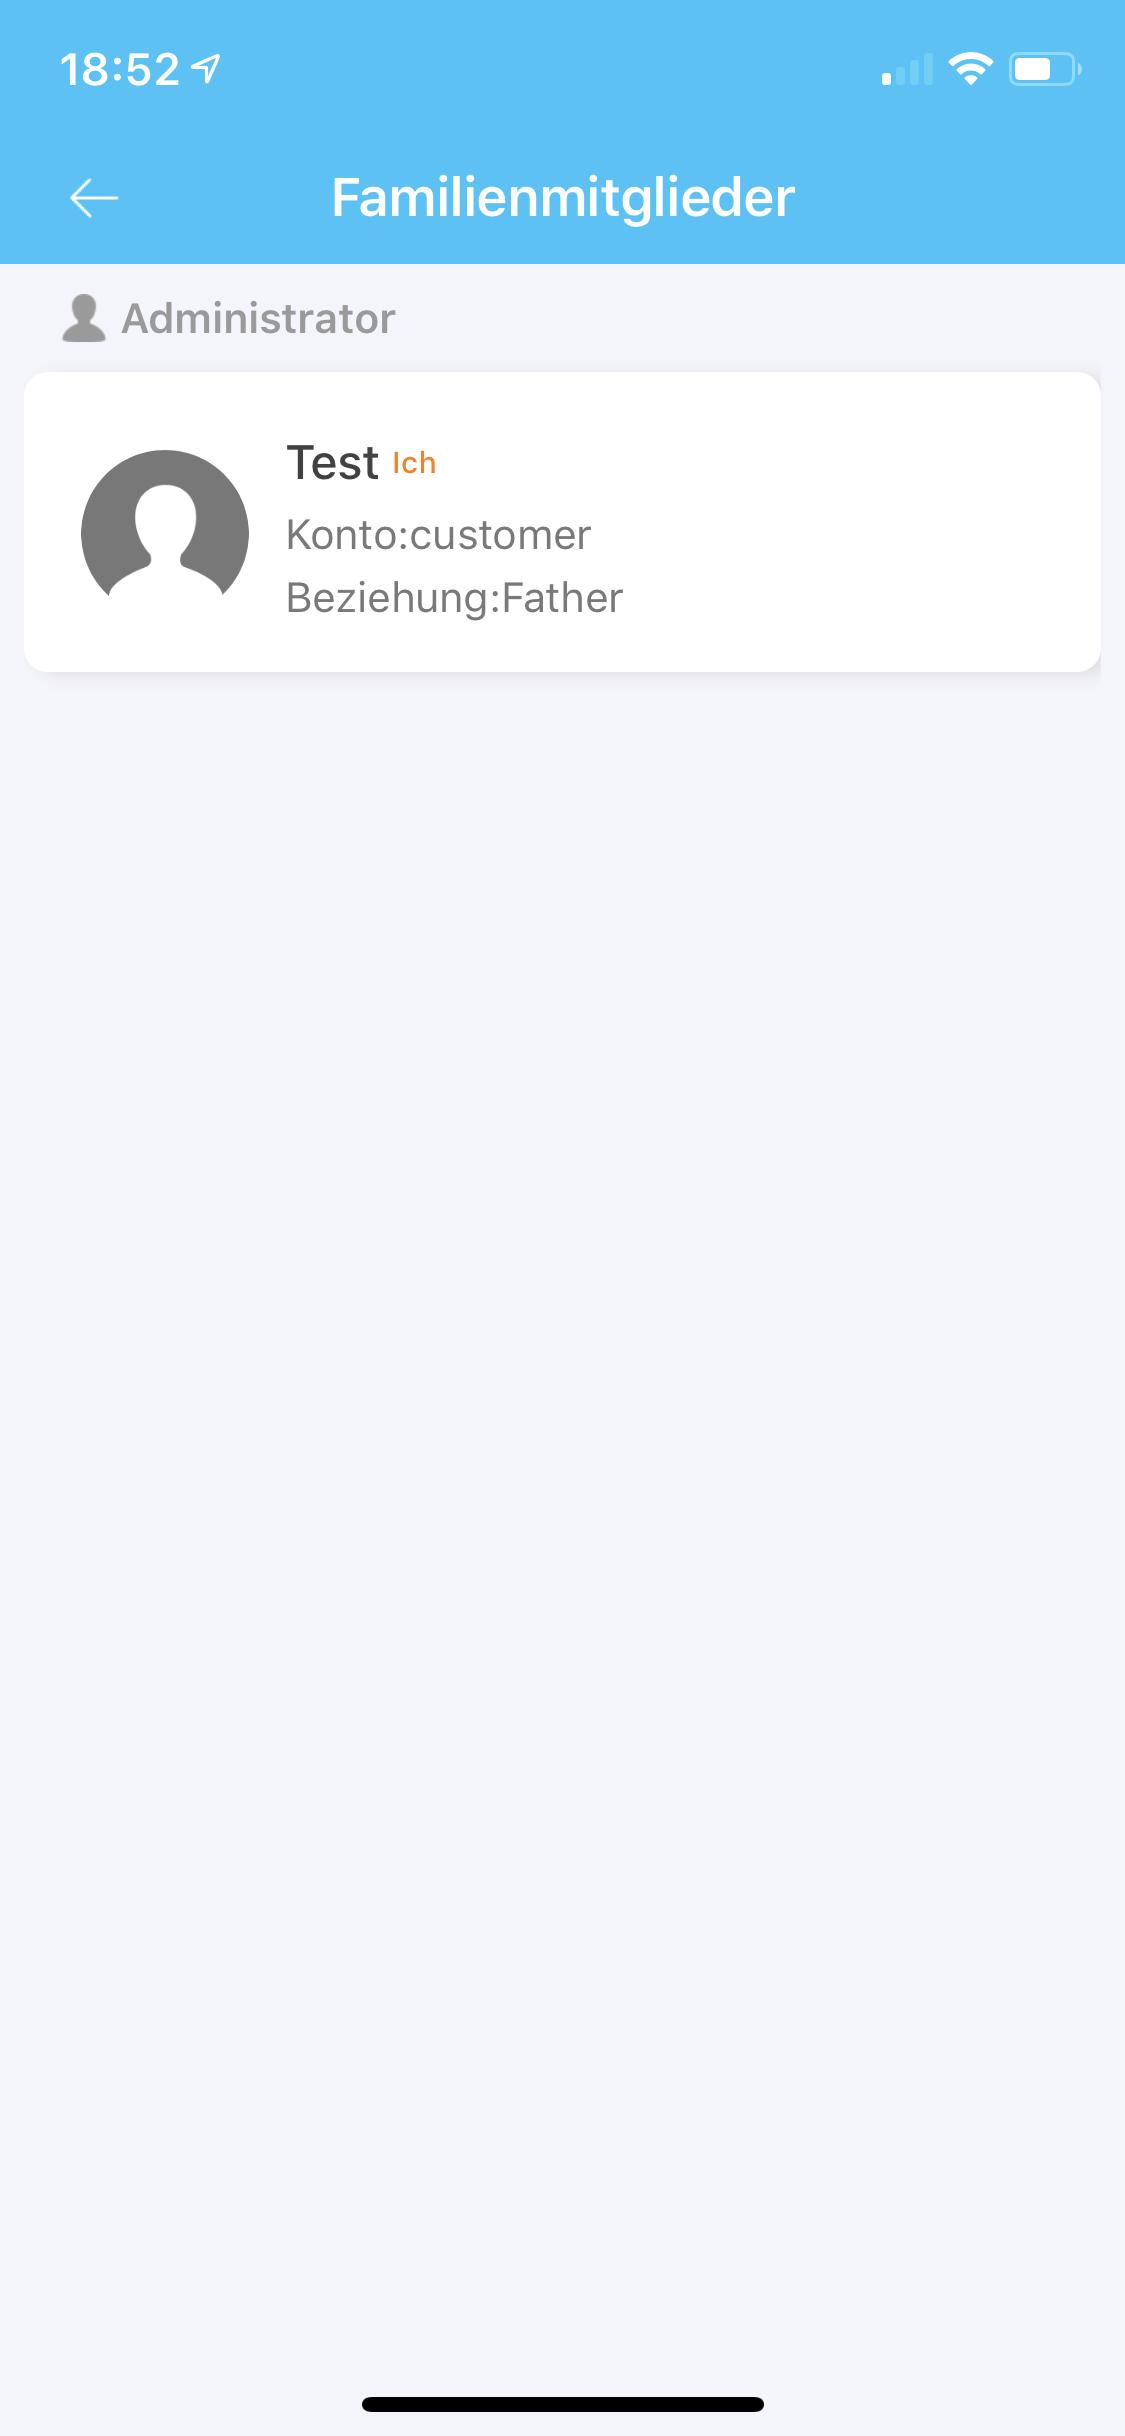 SE-Tracker-App Familienmitglieder